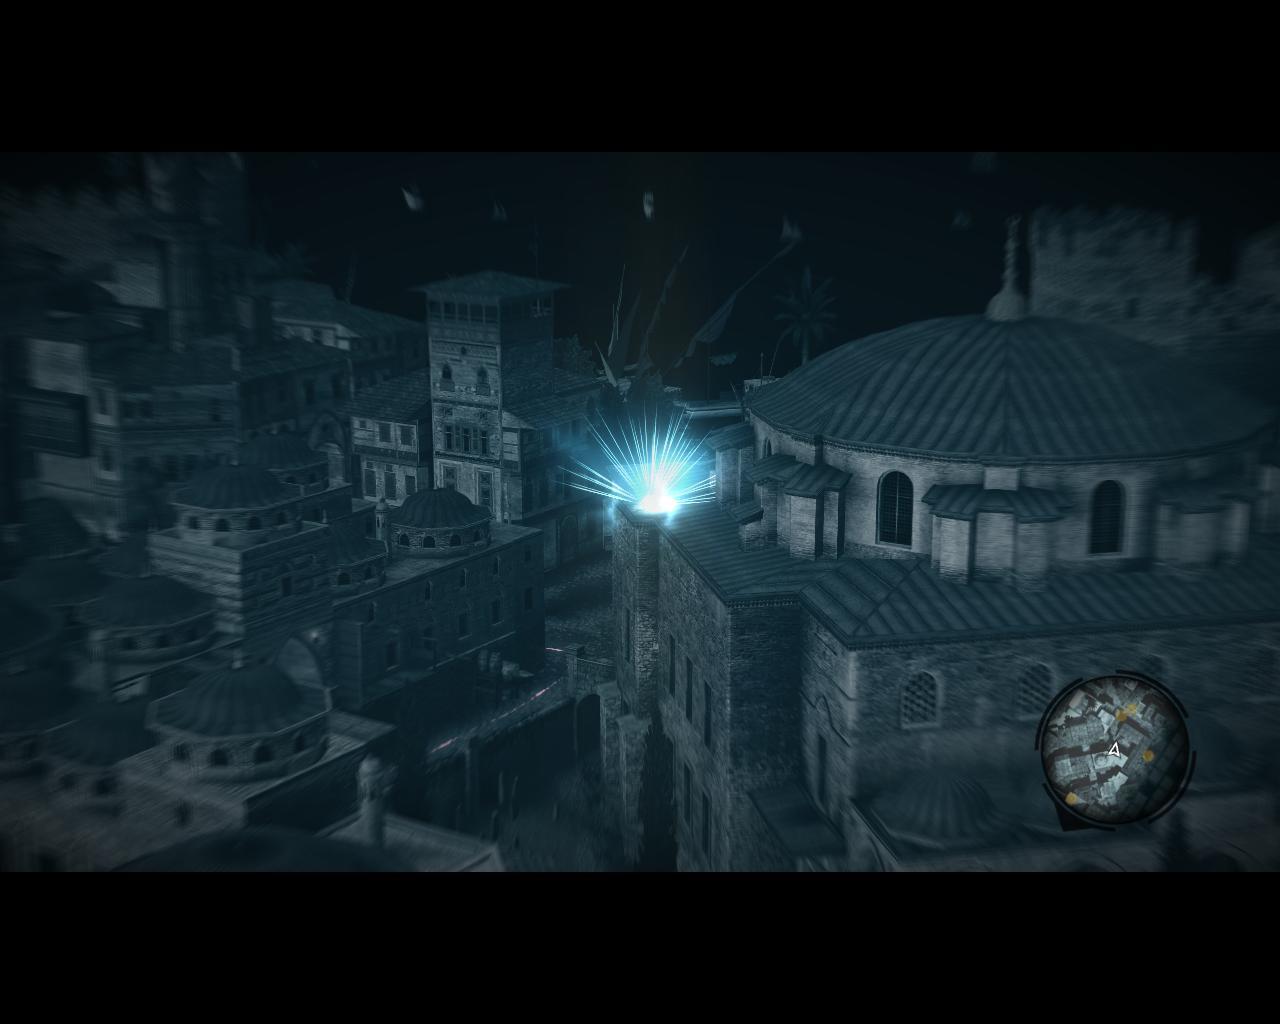 ACRSP 2011-11-25 01-08-45-38.jpg - Assassin's Creed: Revelations